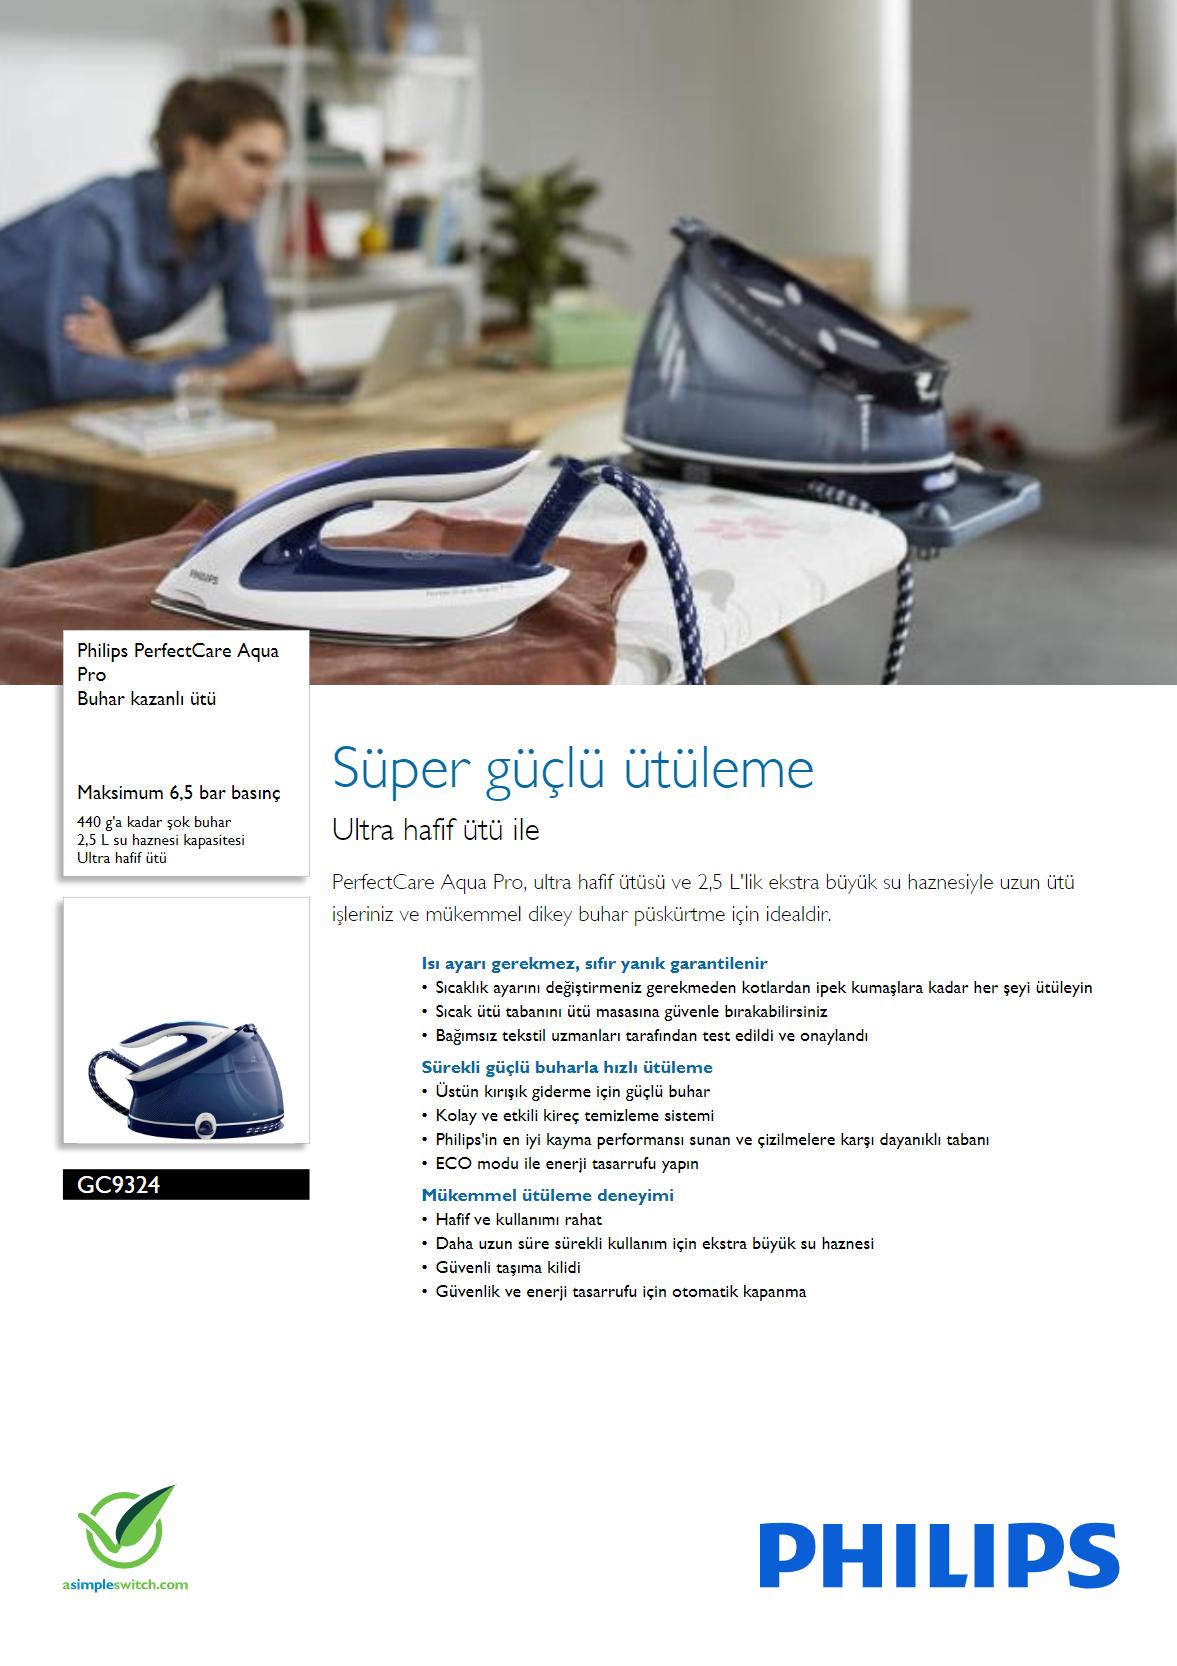 Philips GC9324/20 Perfect Care Aqua Pro Buhar Kazanlı Ütü